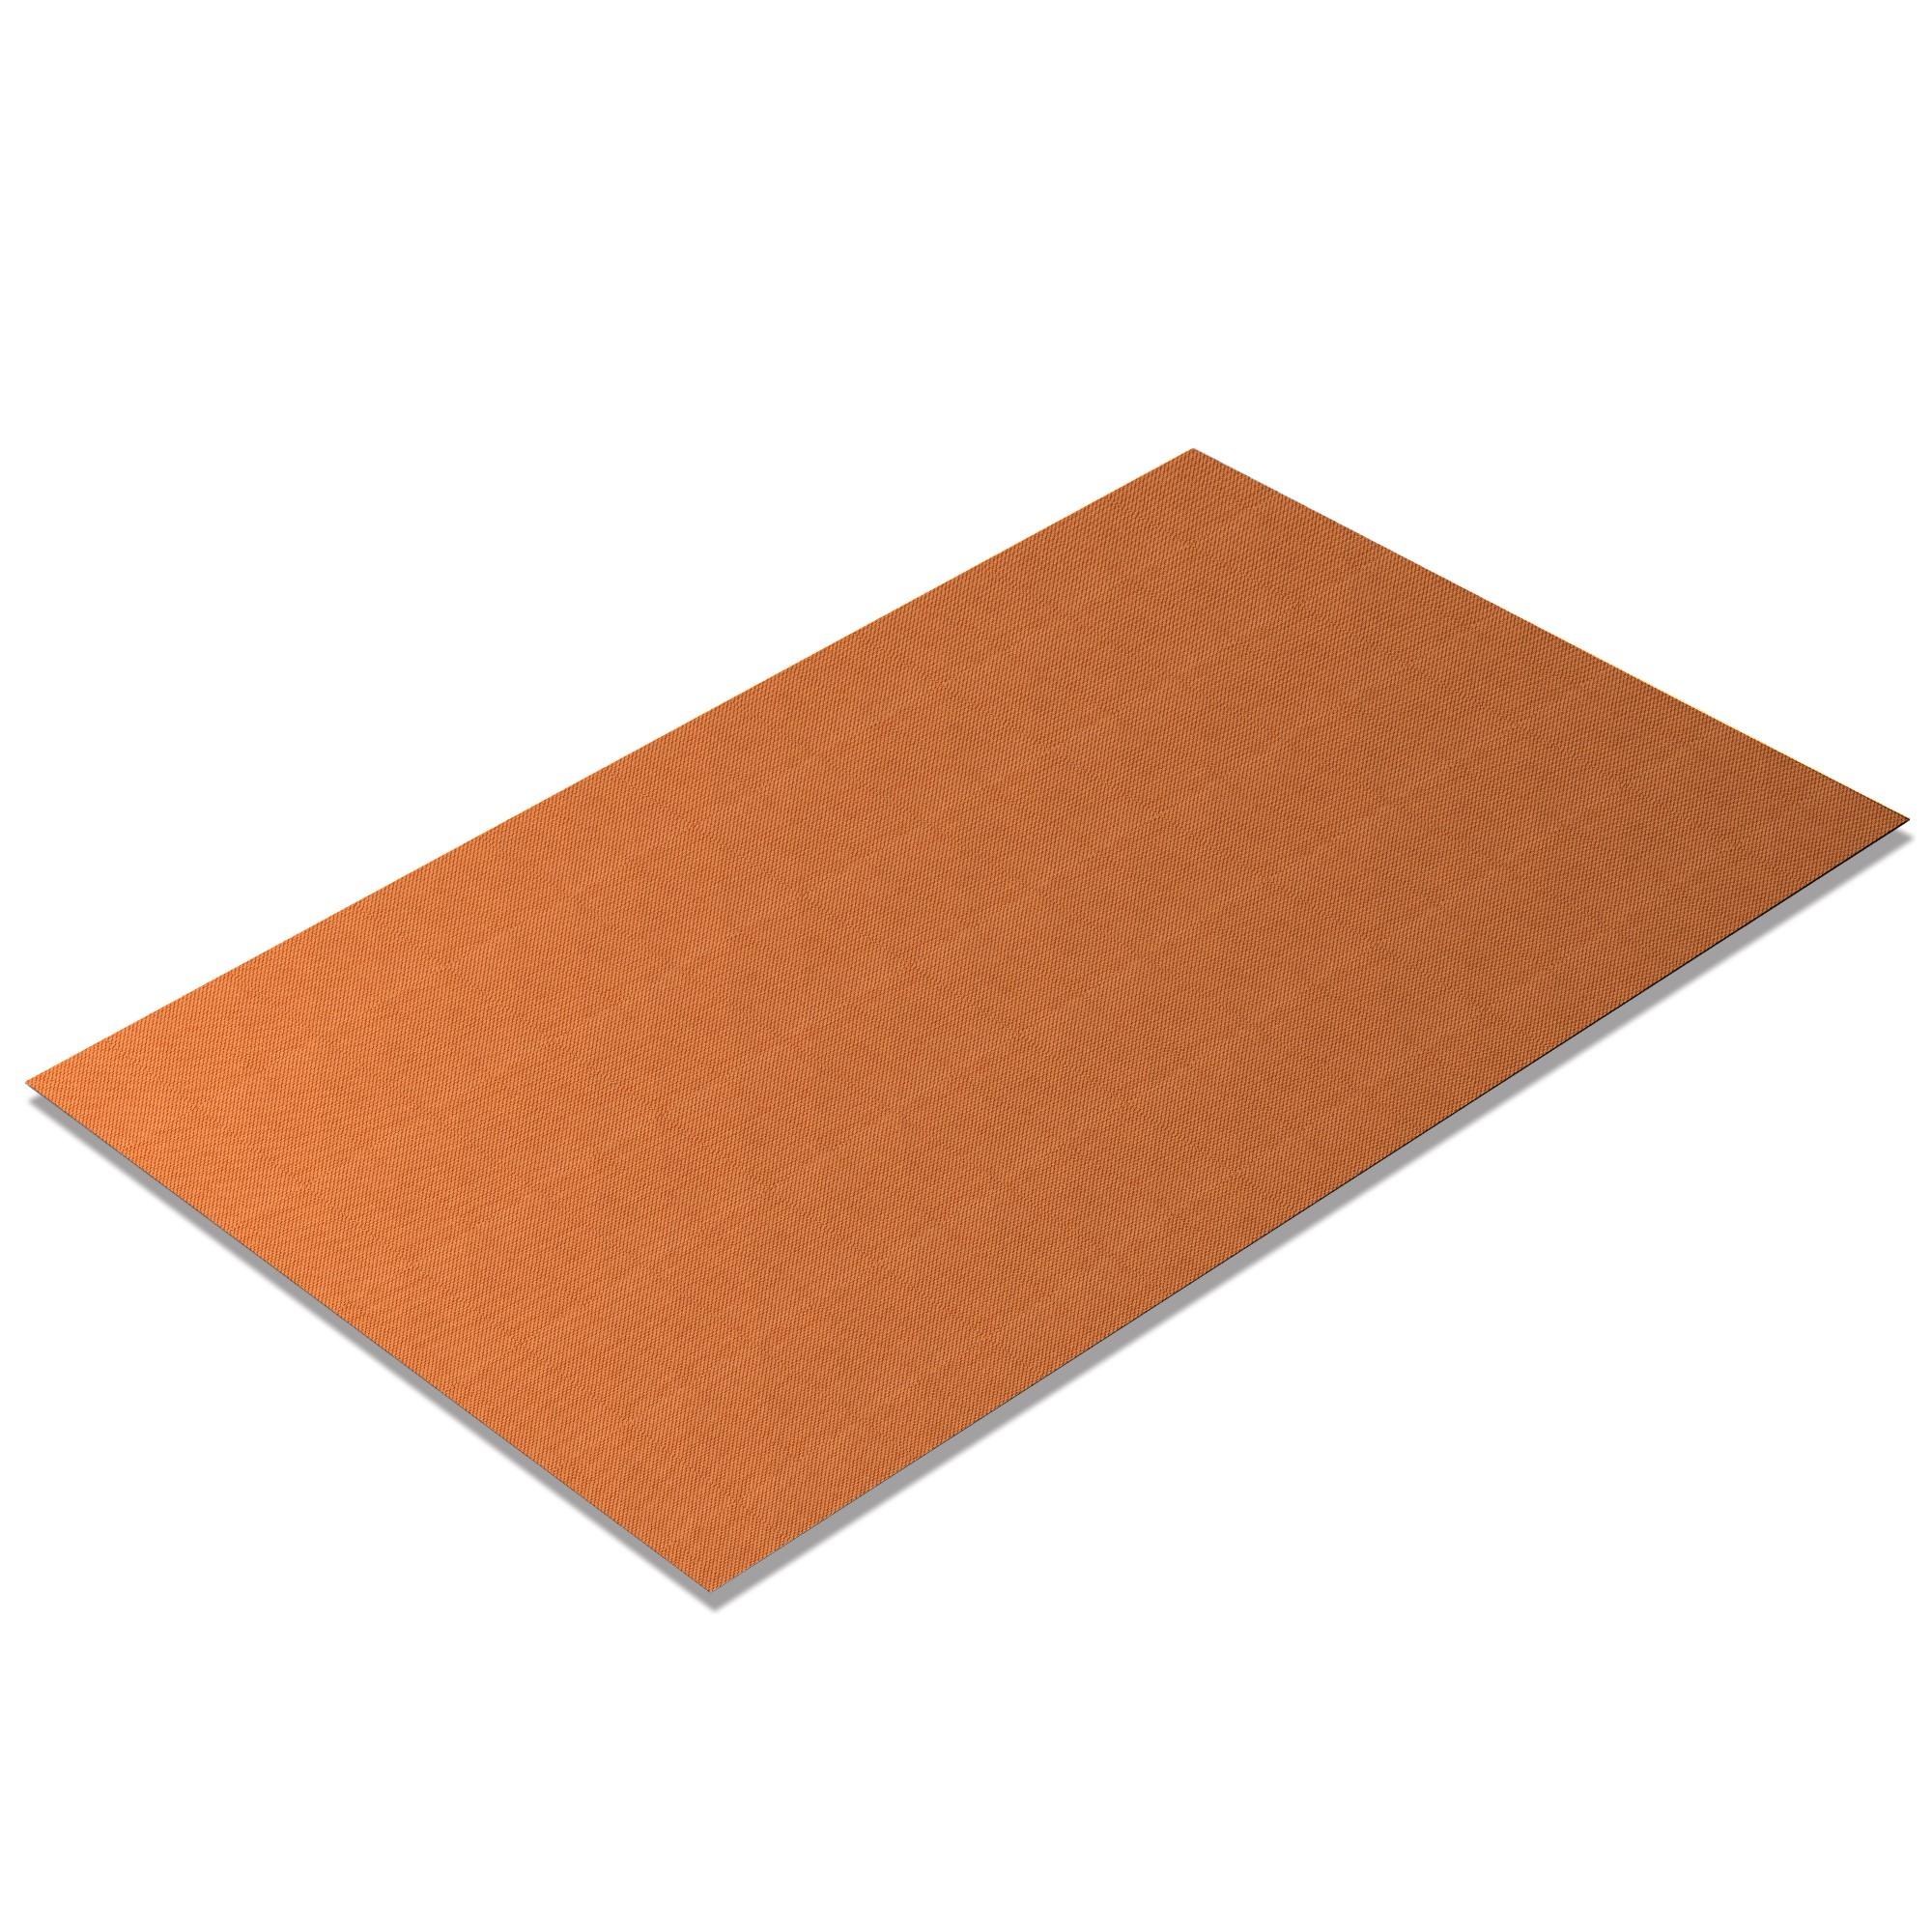 Stoff Meterware Verona Orange [VER45]